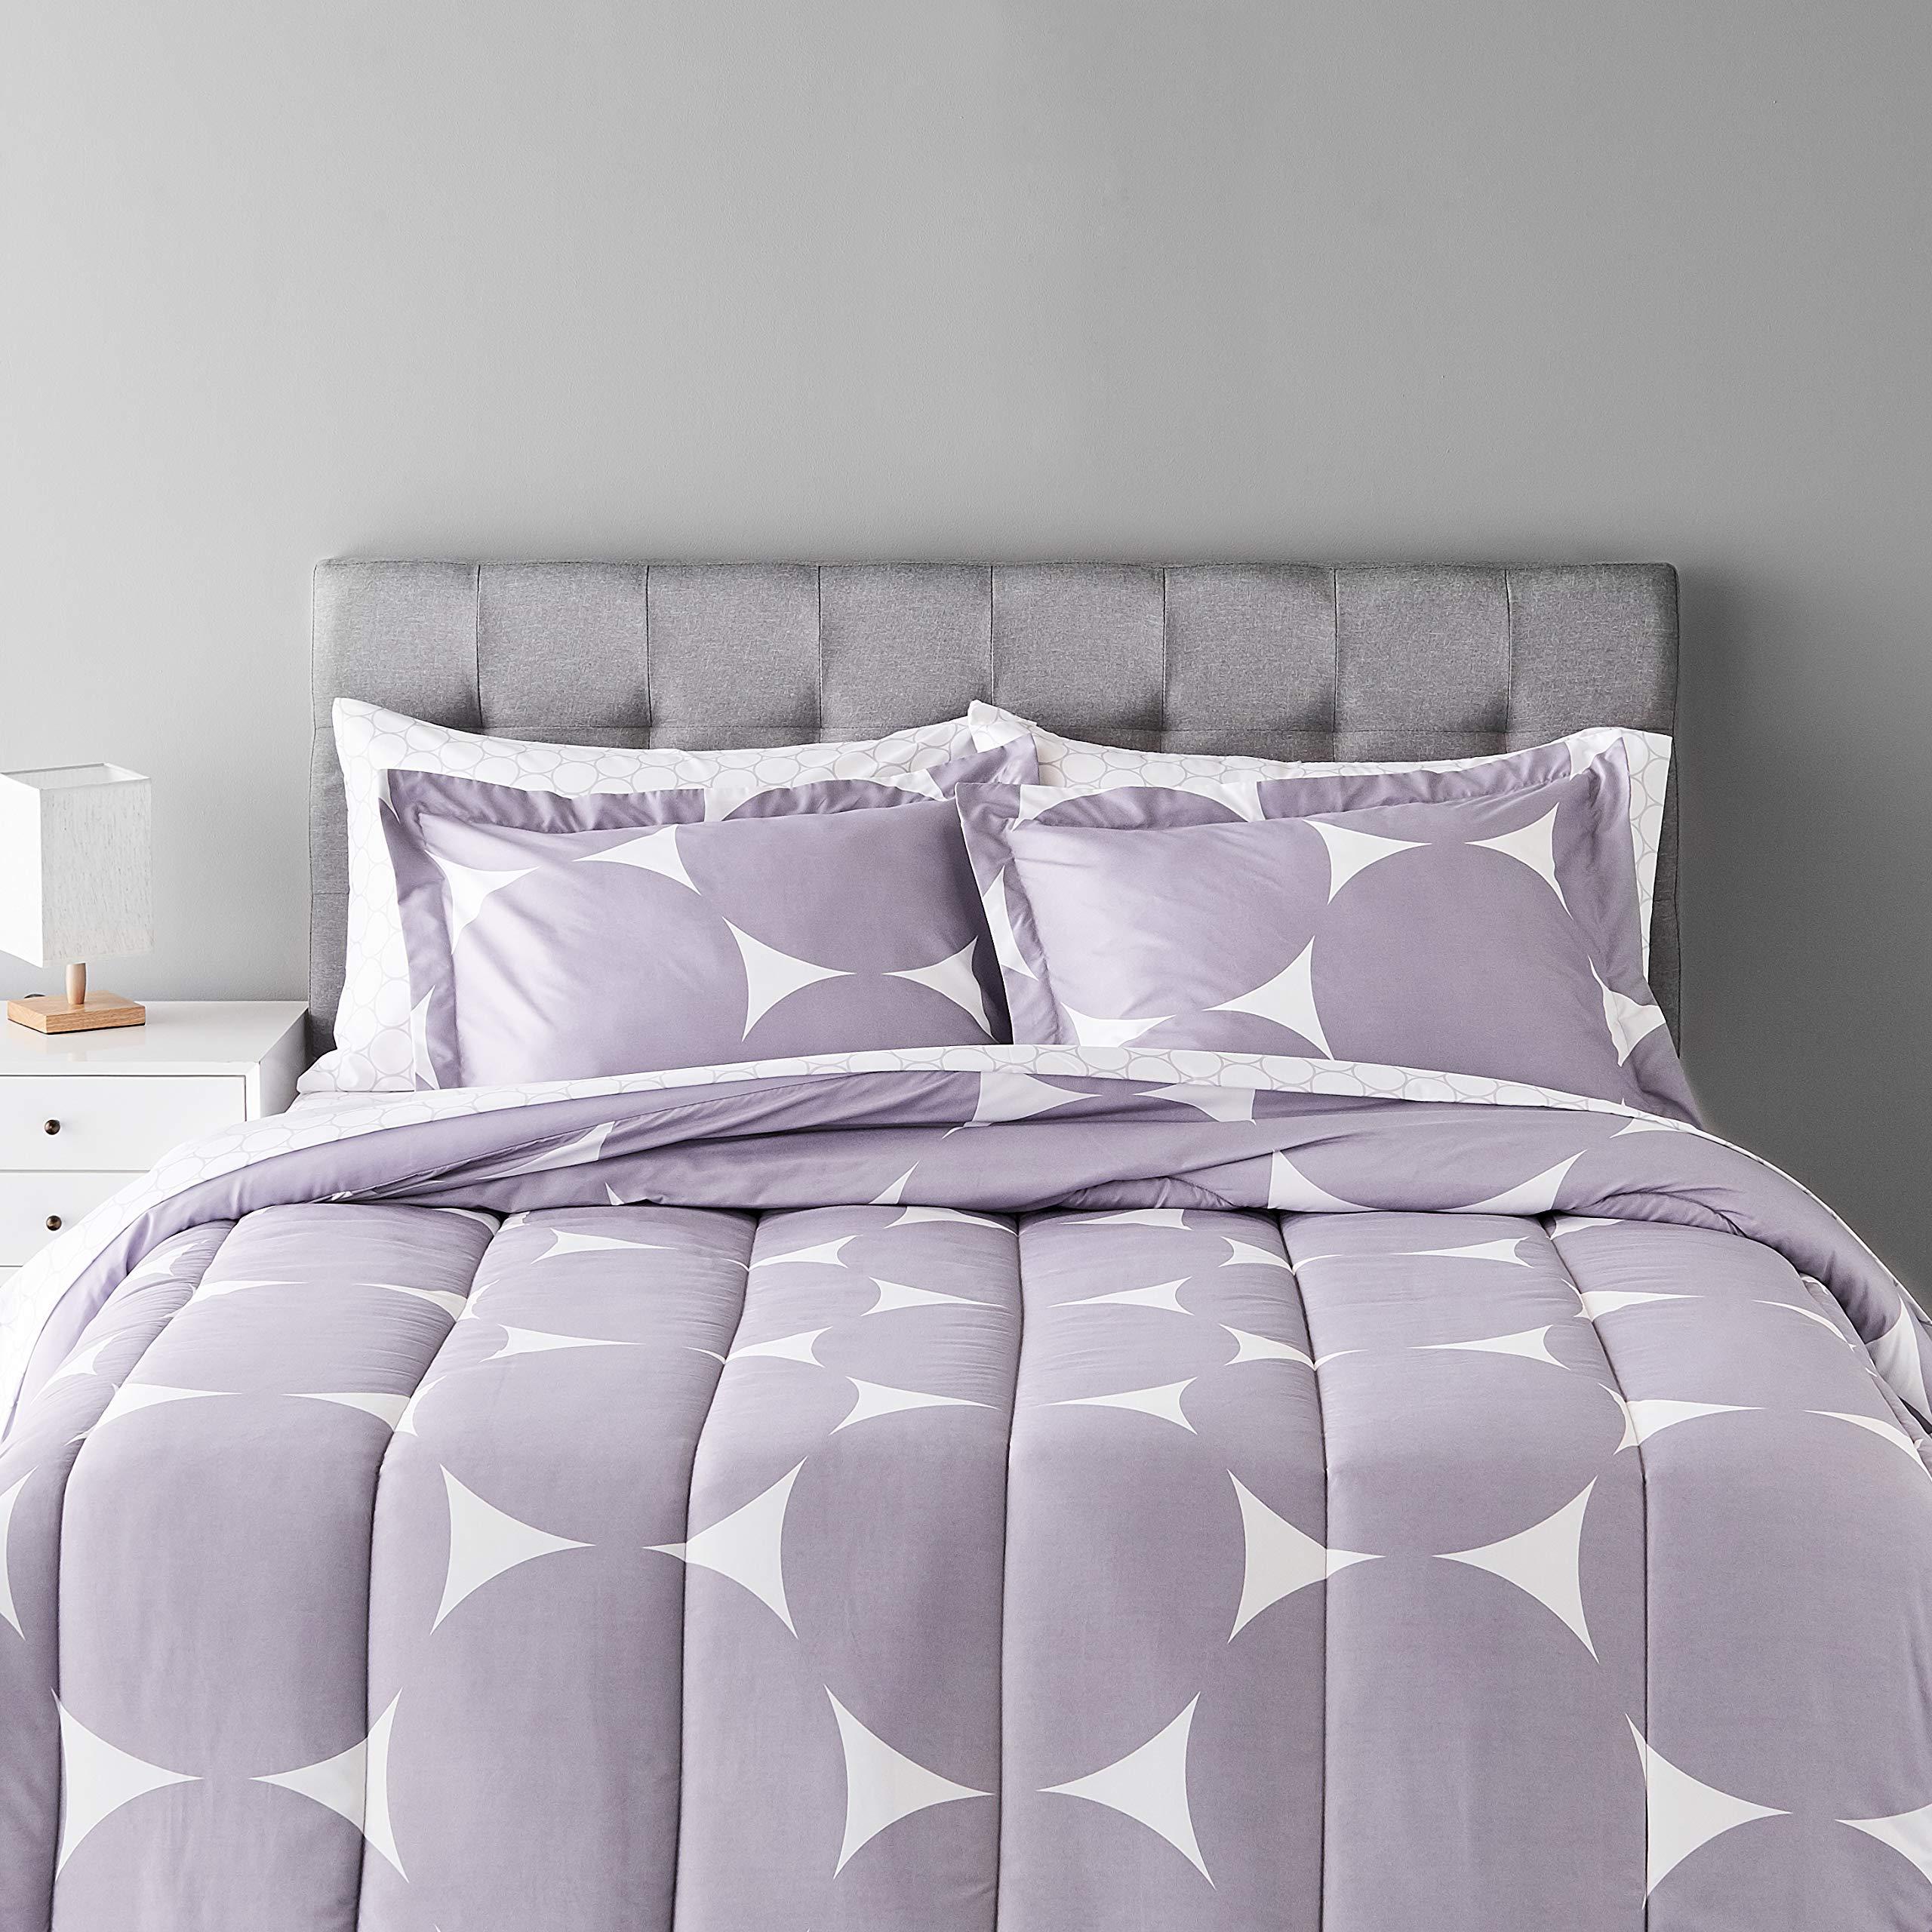 Amazon Basics 7-Piece Light-Weight Microfiber Bed-In-A-Bag Comforter Bedding Set - Full/Queen, Purple Mod Dot